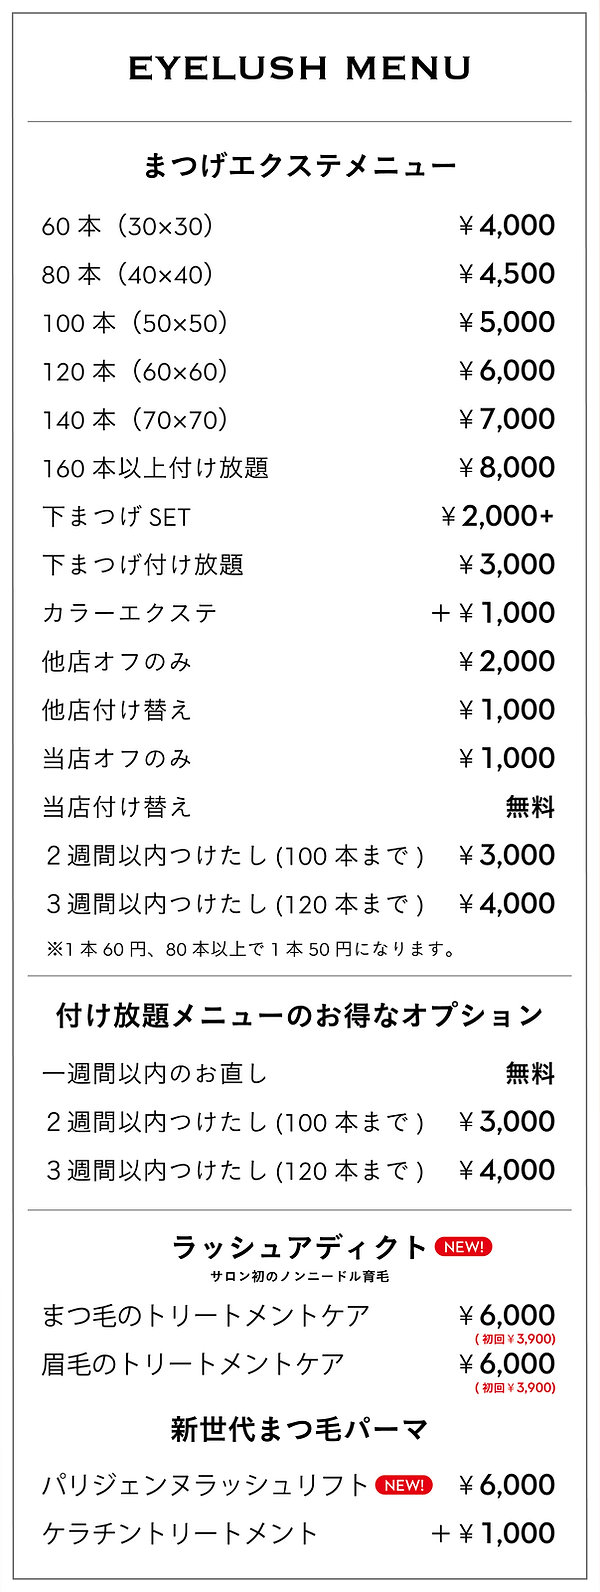 nail_2020-01-01.jpg